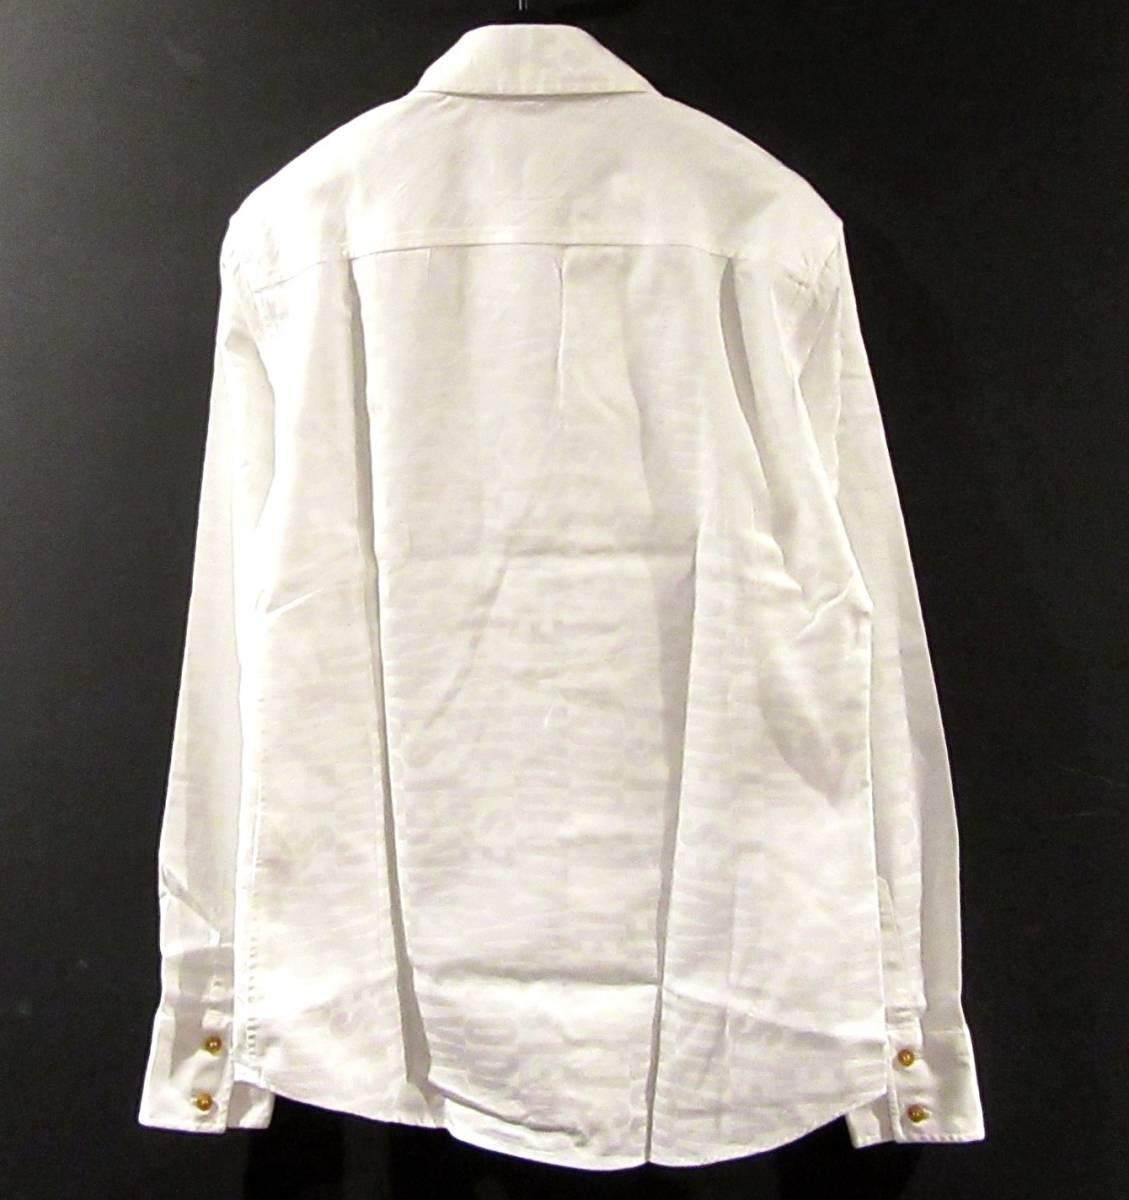 Vivienne Westwood MAN ロゴ総柄 オジークラークシャツ アシンメトリー コットン ブラウス 白 ORB刺繍 オーブ_画像2